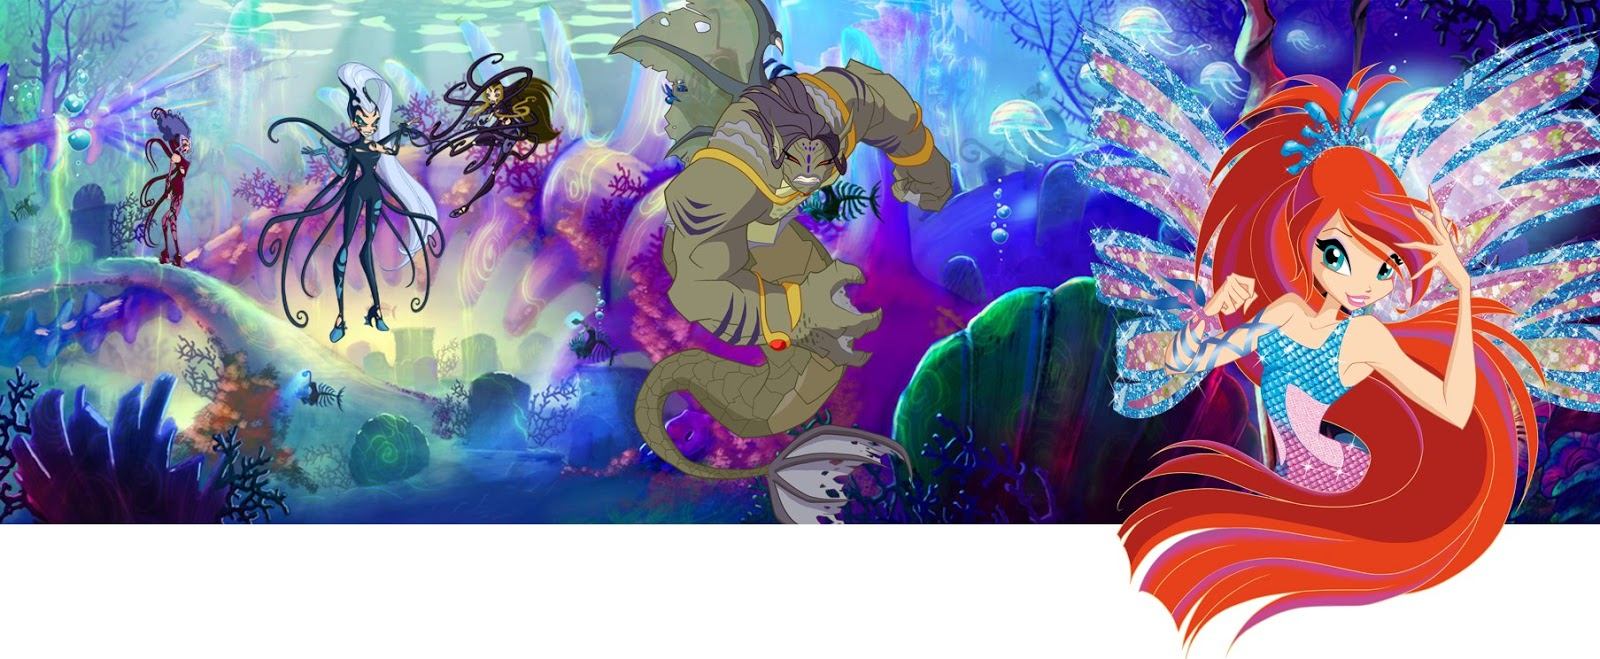 картинка винкс,5 сезон - Картинки ...: www.youloveit.ru/gallery/kartinki-winx/92269-oficialnaya-kartinka...